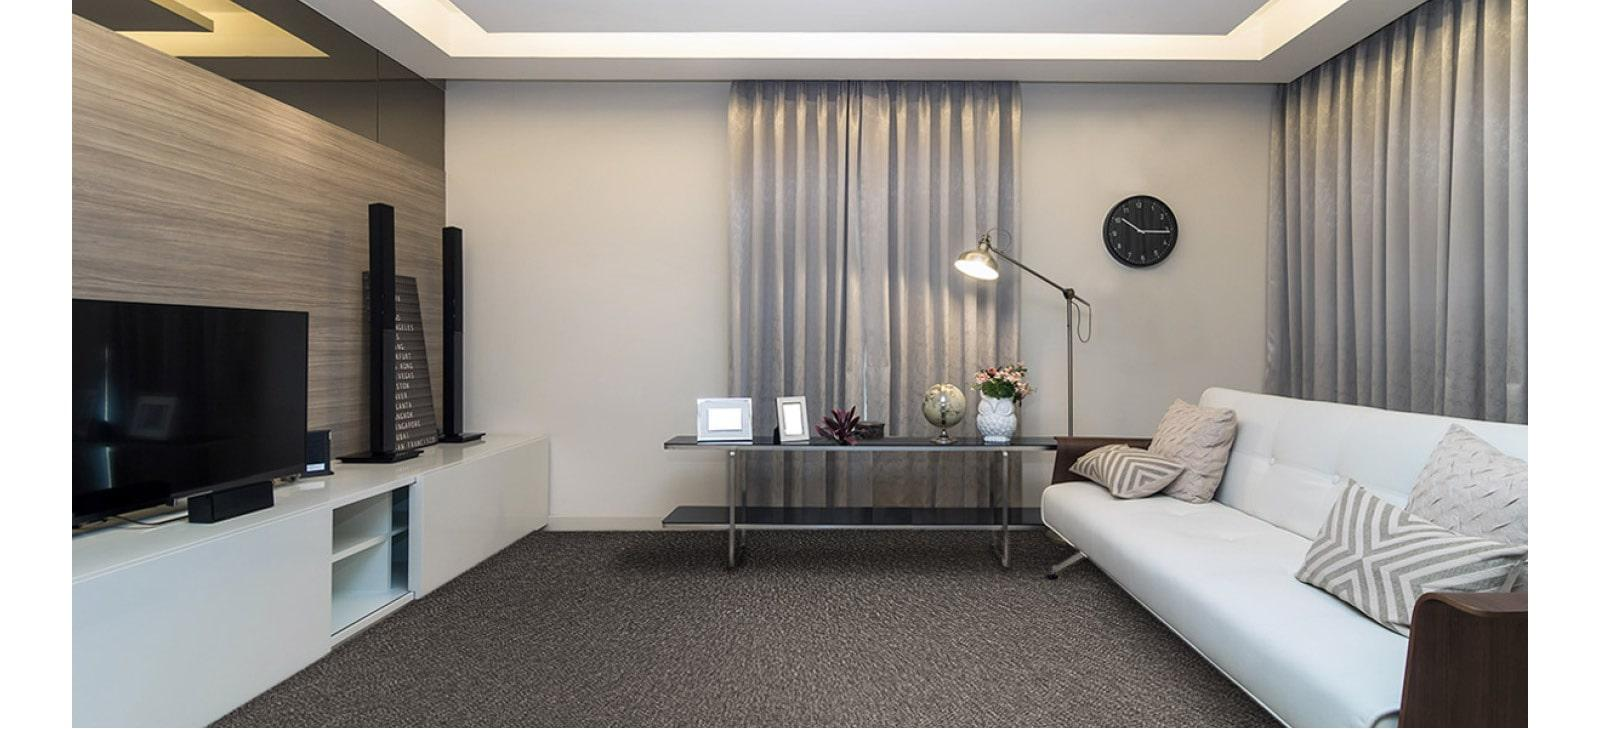 Modern Lounge Roomset with Dark Carpet